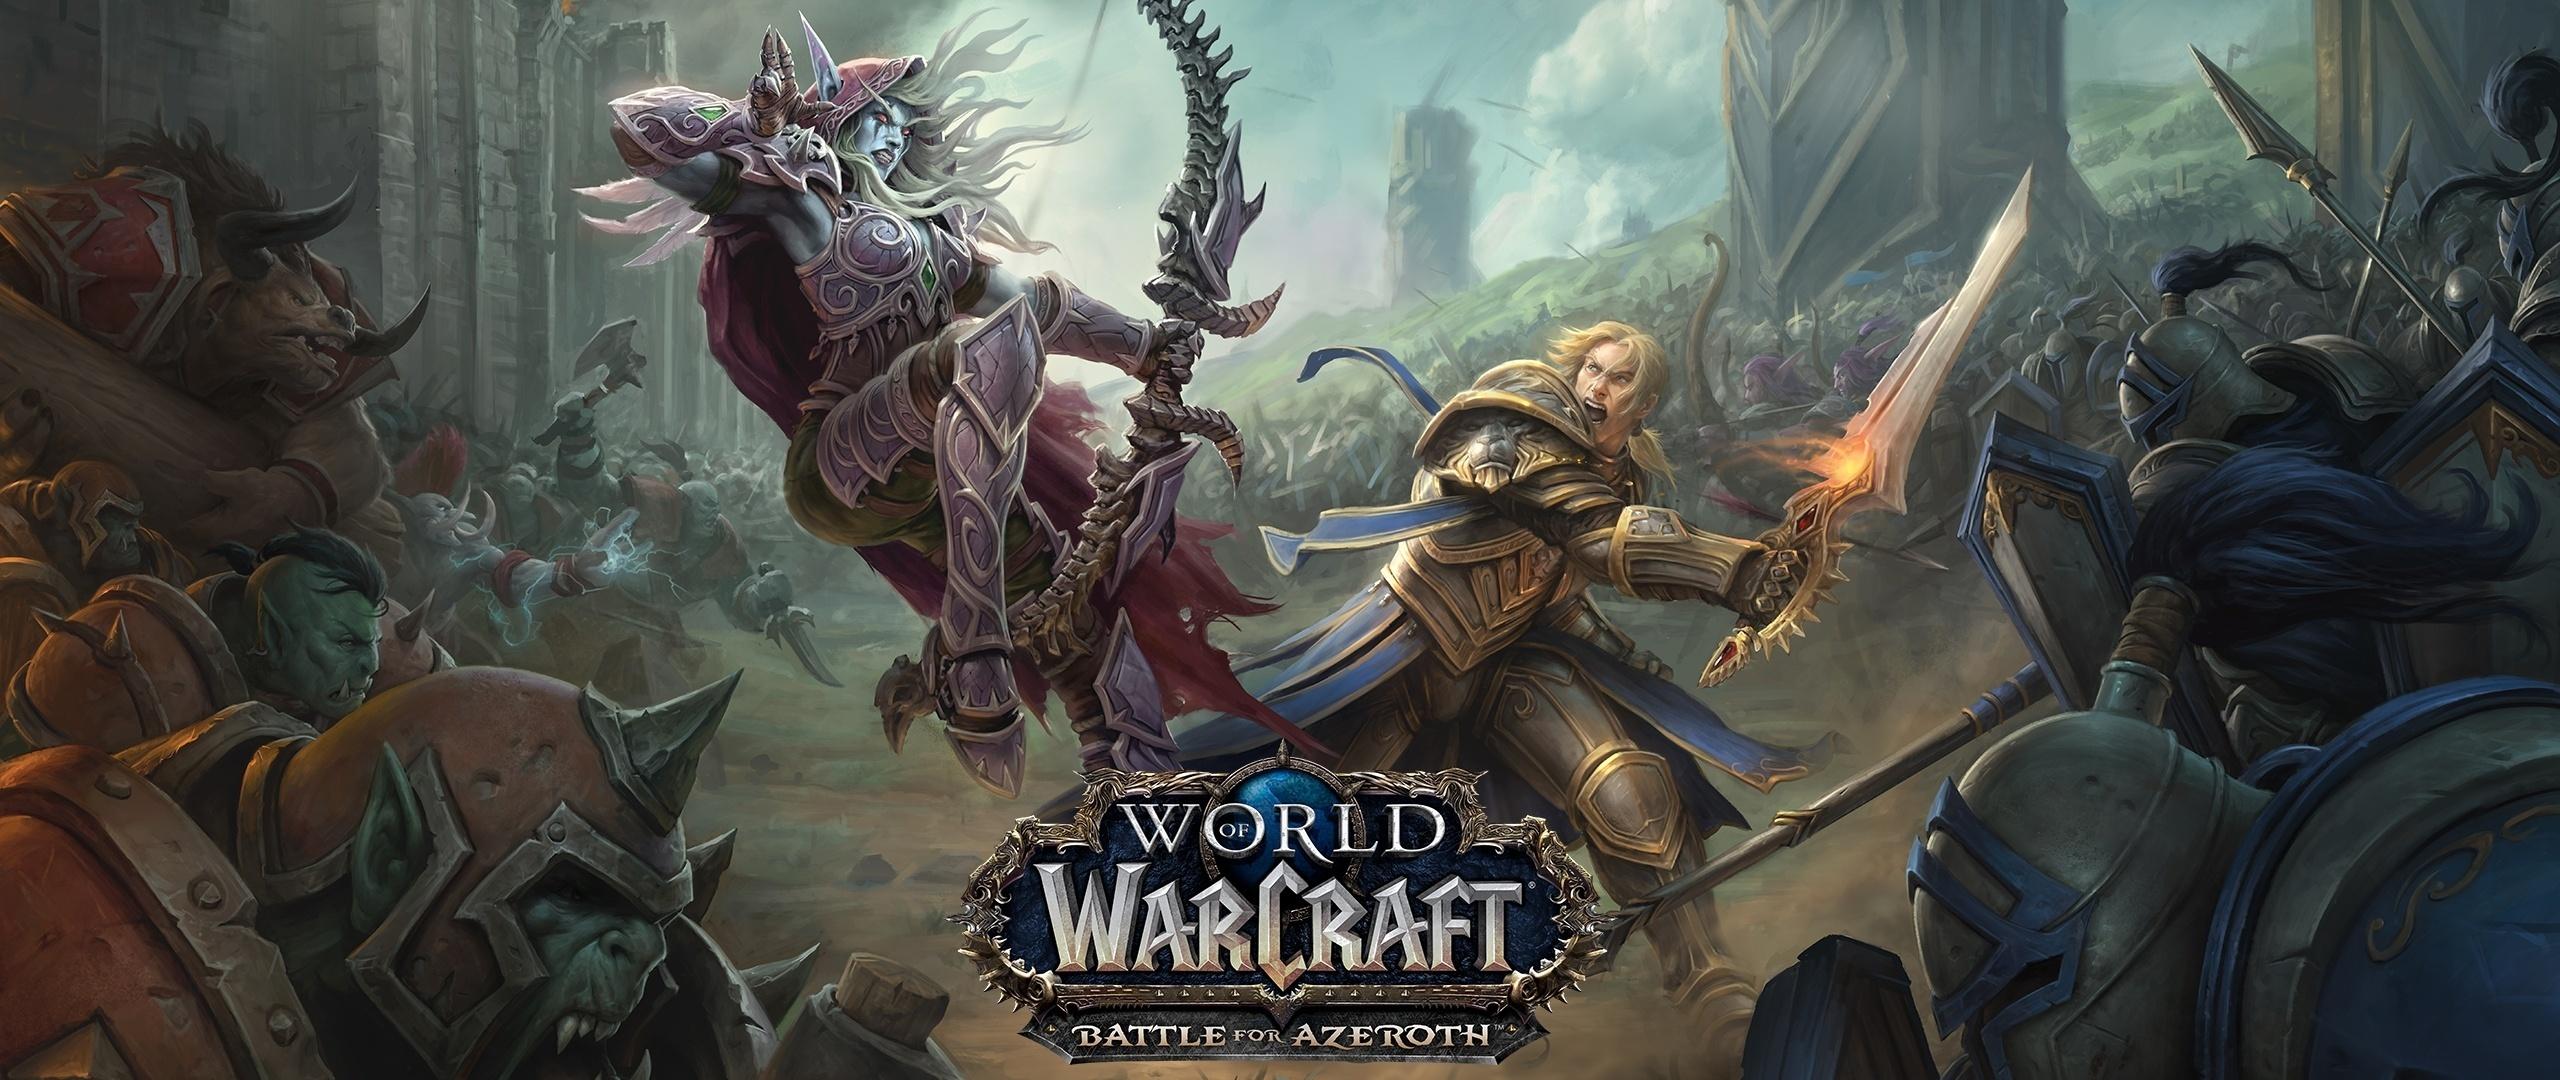 Battle for Azeroth Build 26433 Class Changes - Blood DK